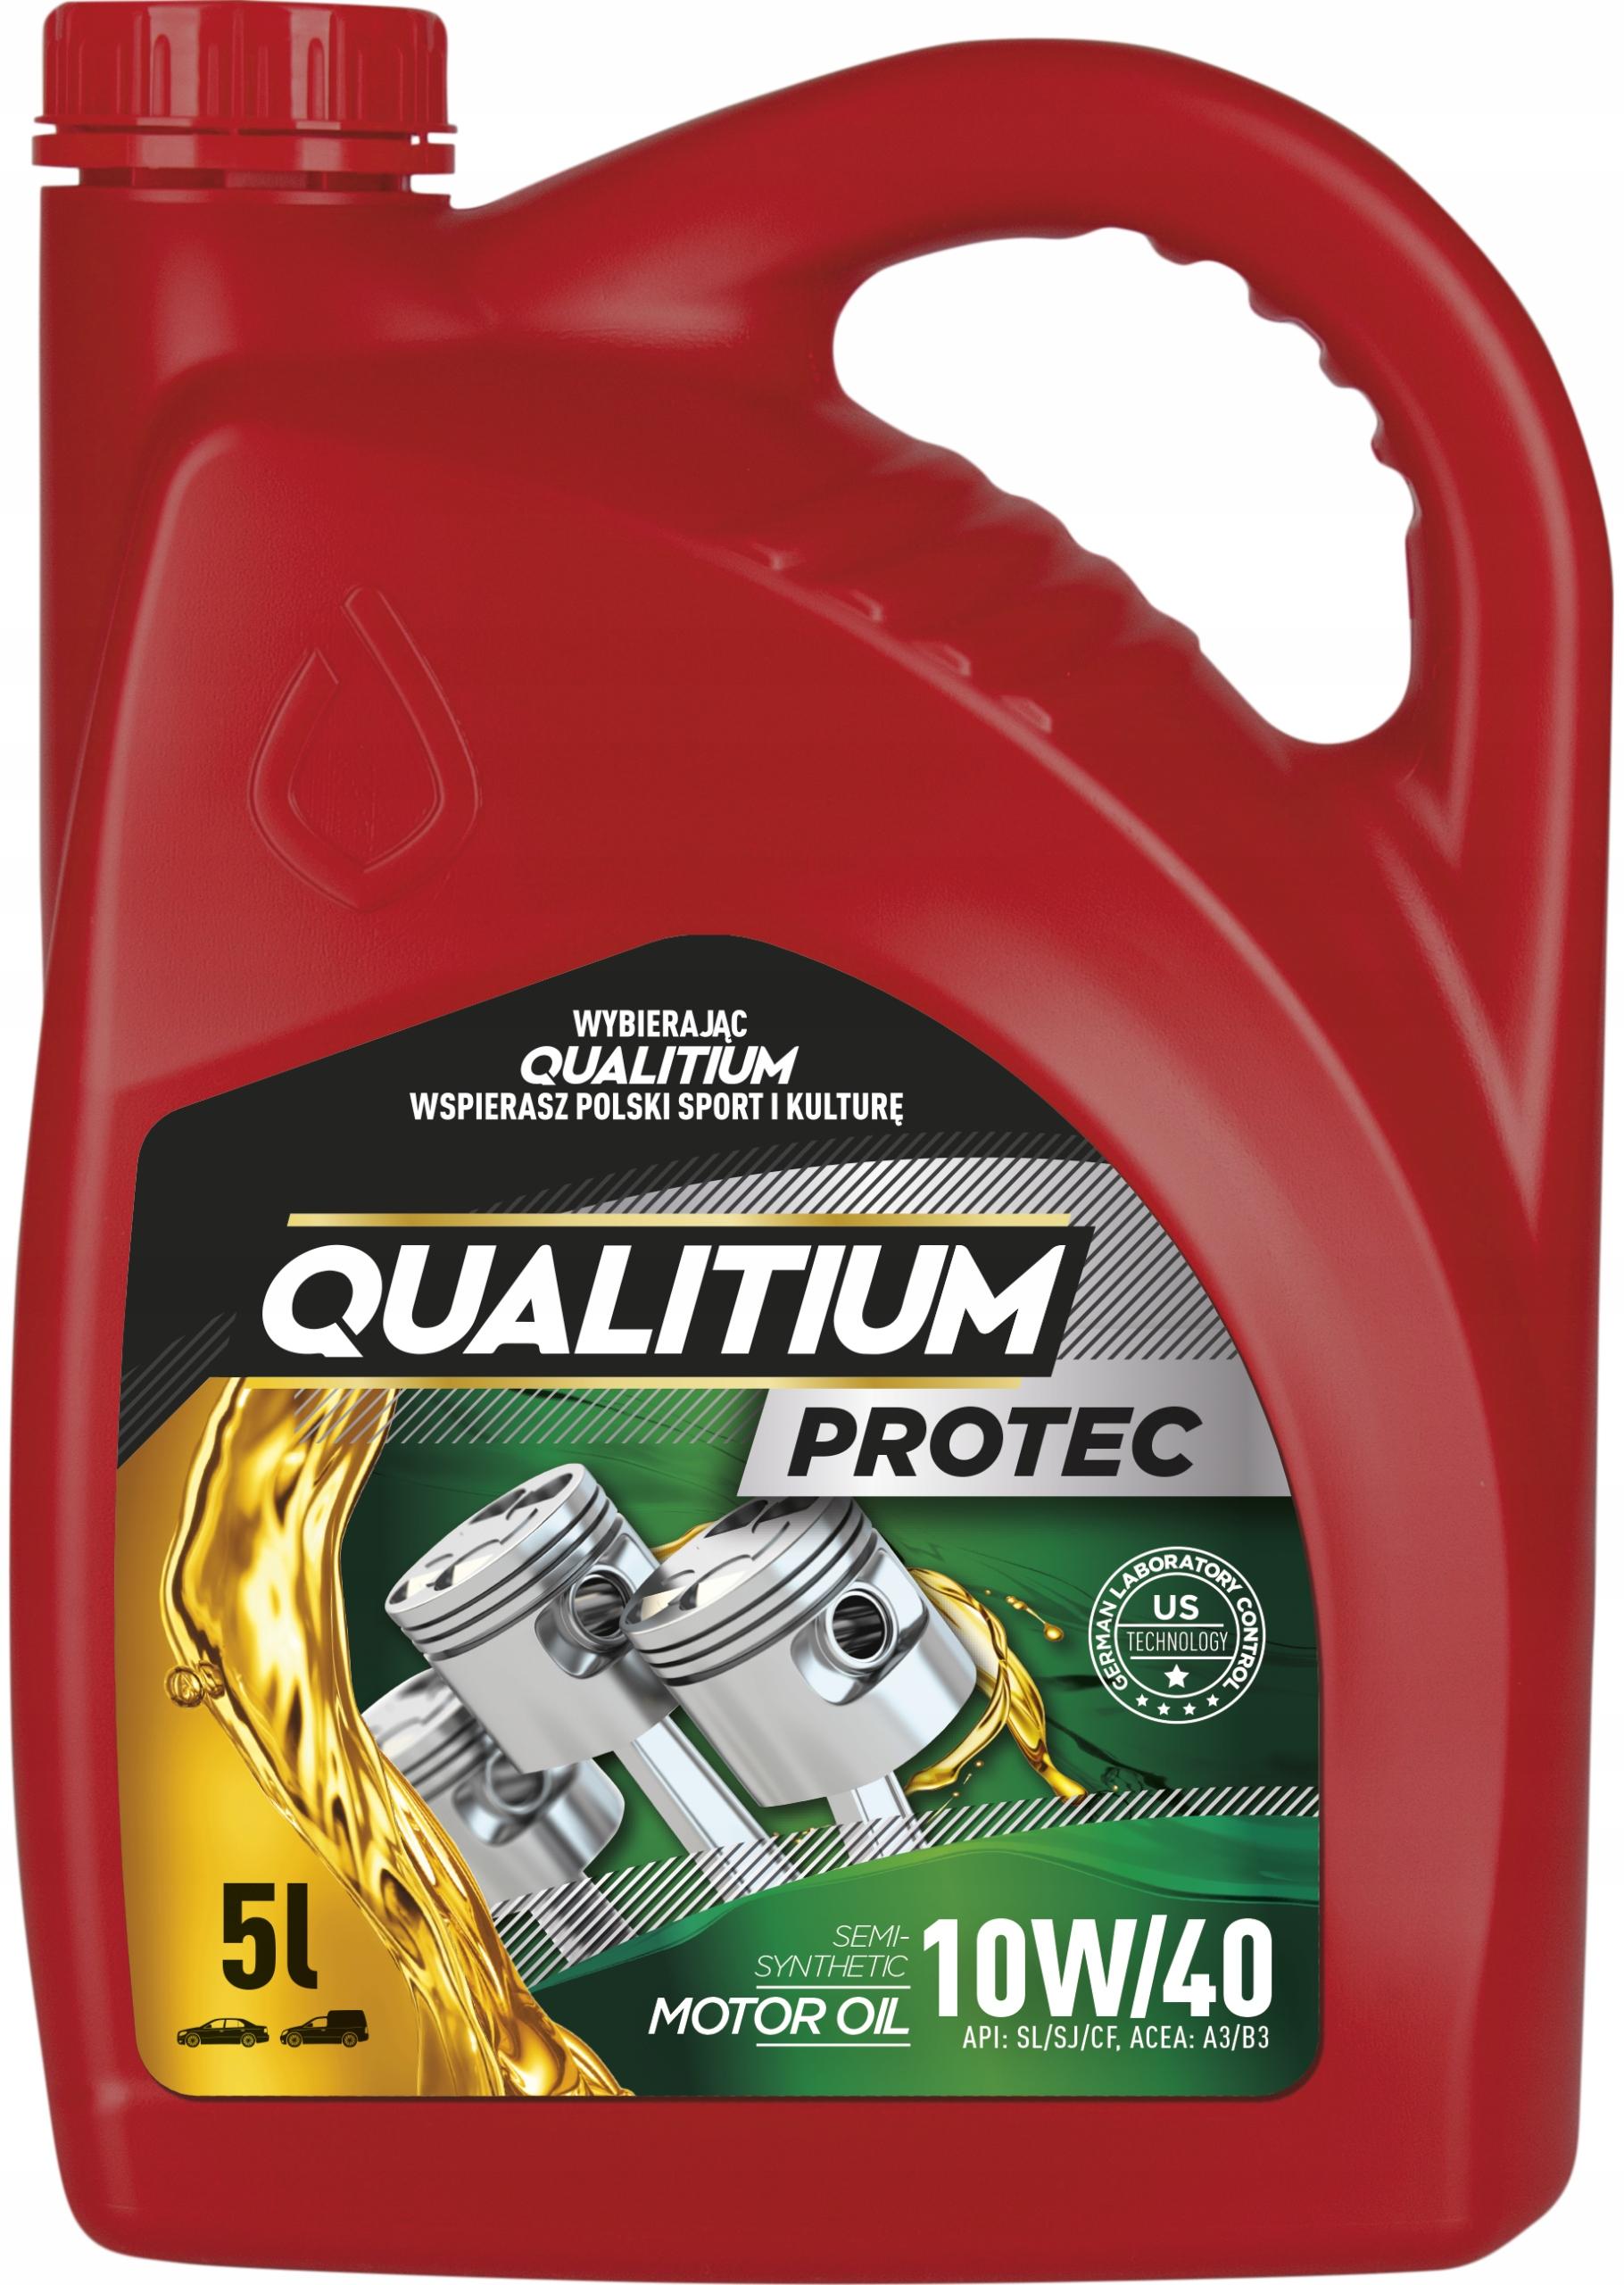 QUALITIUM PROTEC 10W40 5L Полусинтетическое масло